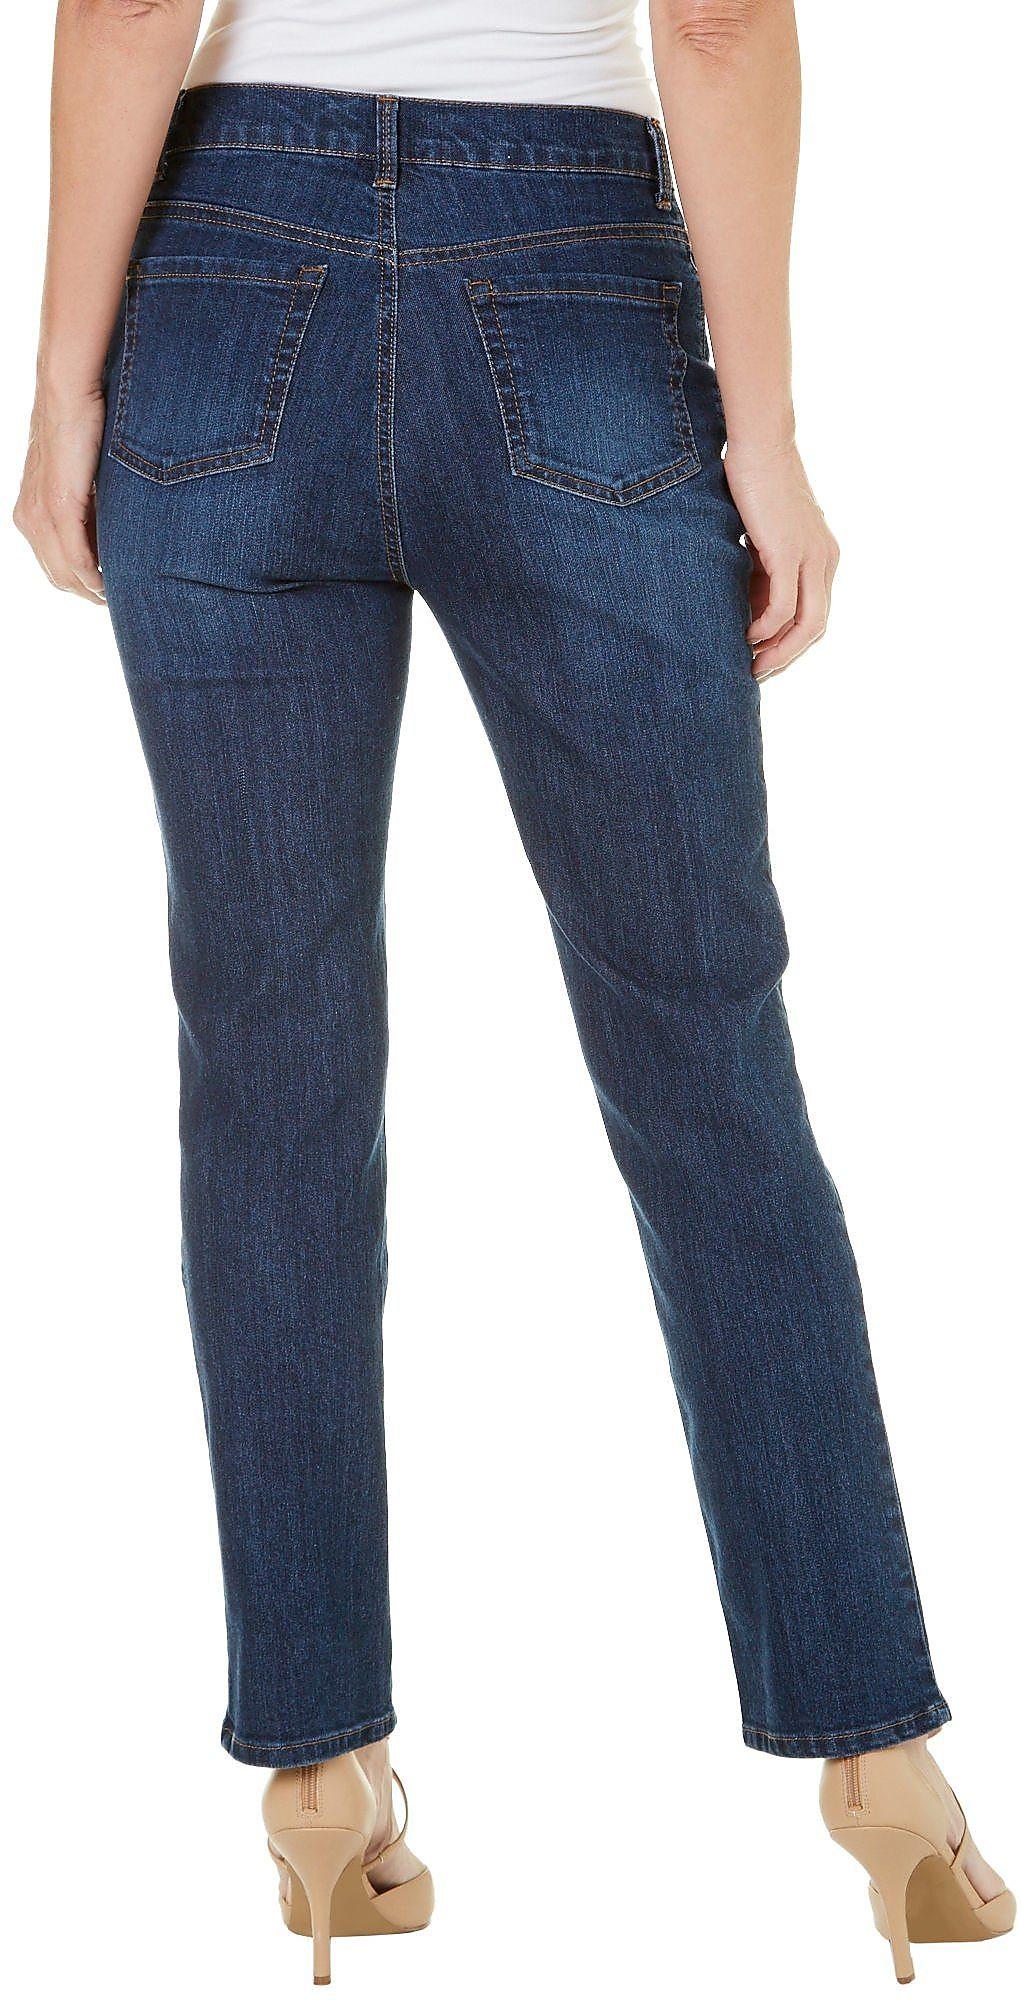 151677ca10df7 Details about Gloria Vanderbilt Petite Amanda Straight Leg Jeans